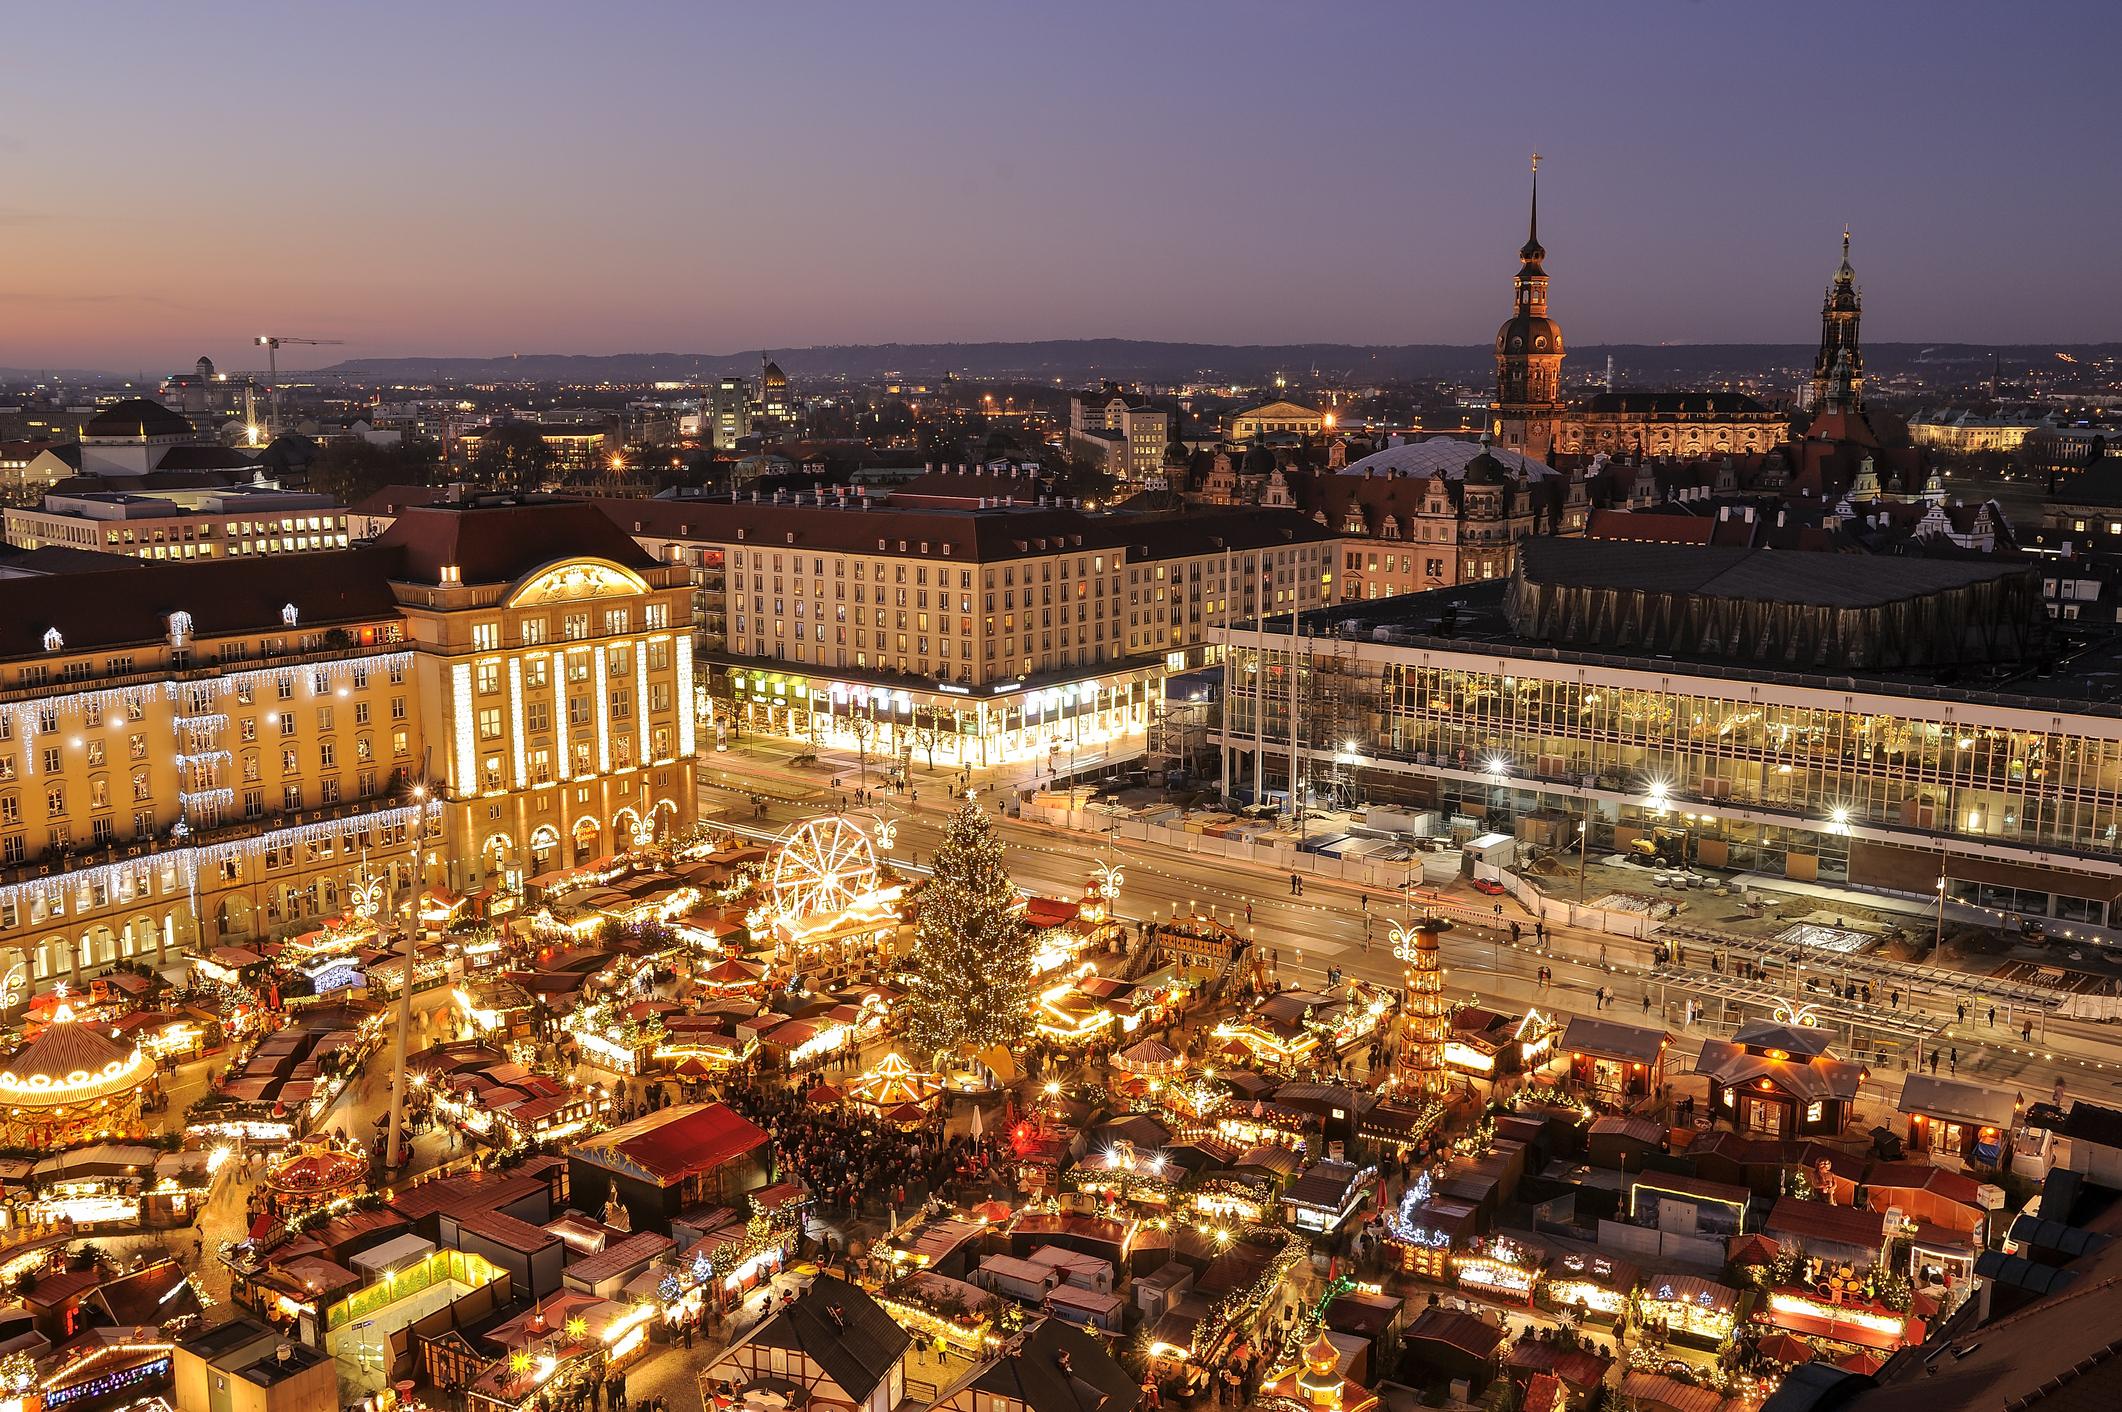 Germany's enchanting Christmas markets